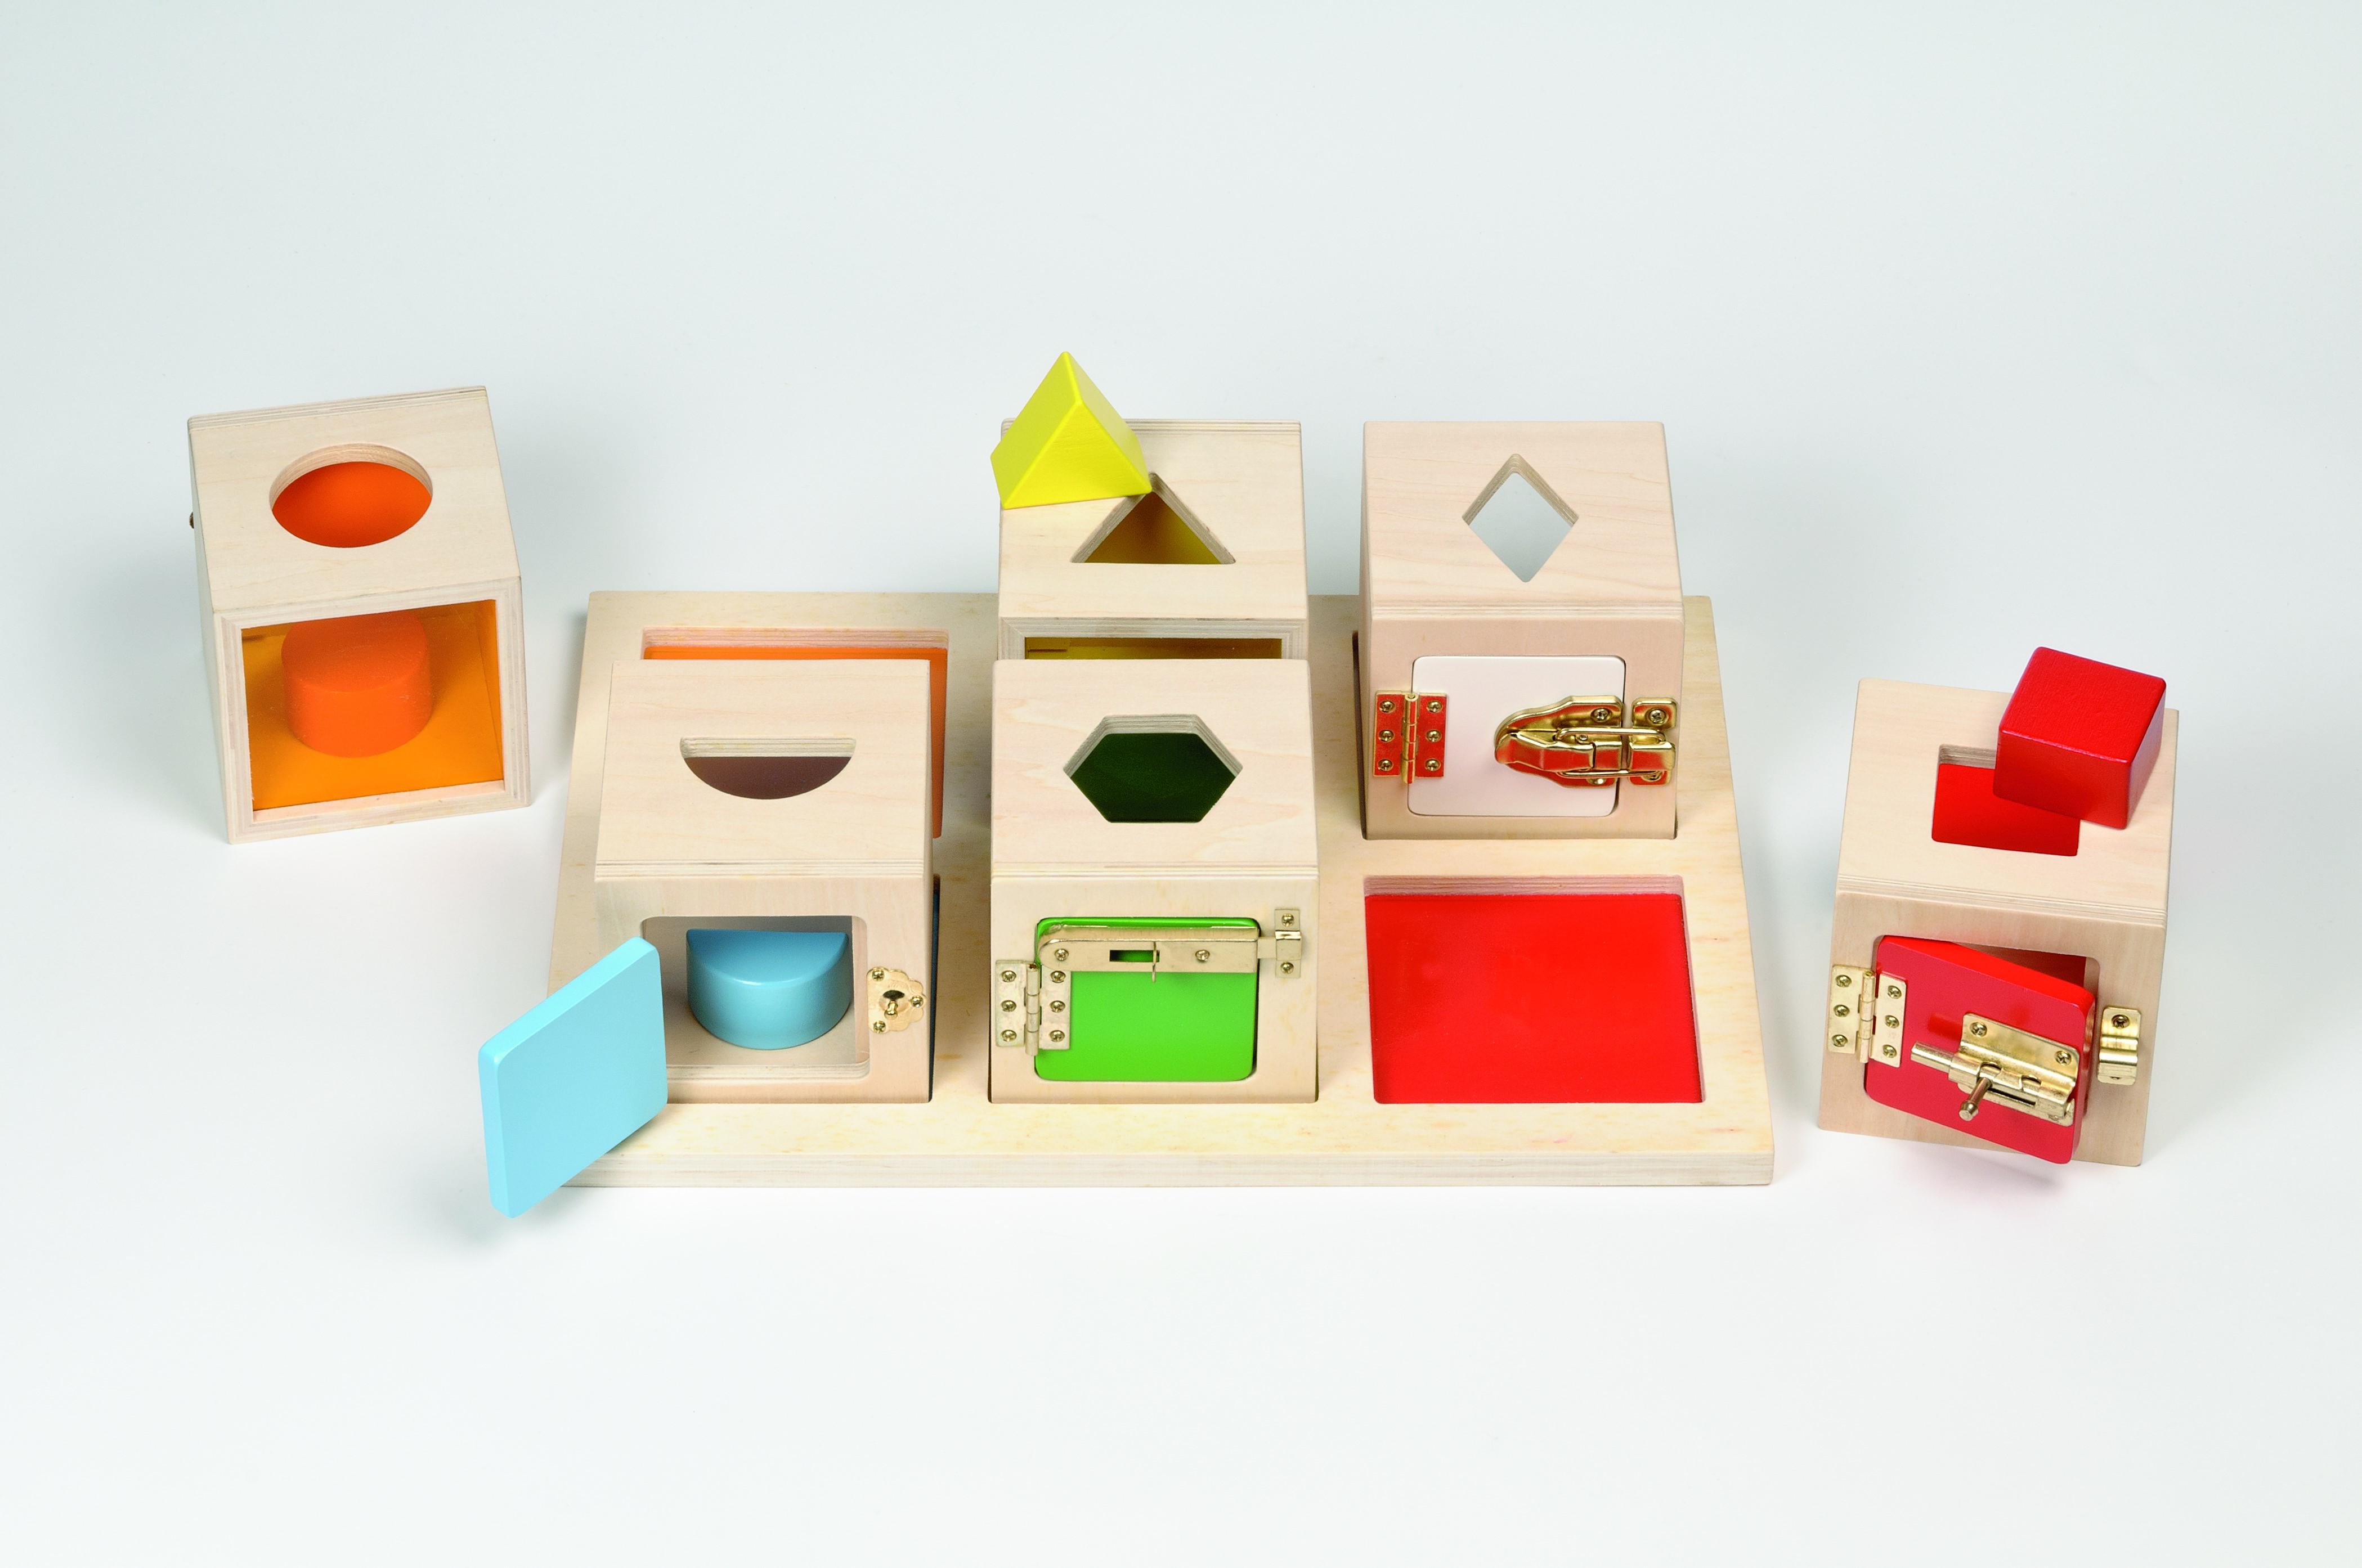 jeu de manipulation boite a serrure par ludesign ludomania. Black Bedroom Furniture Sets. Home Design Ideas